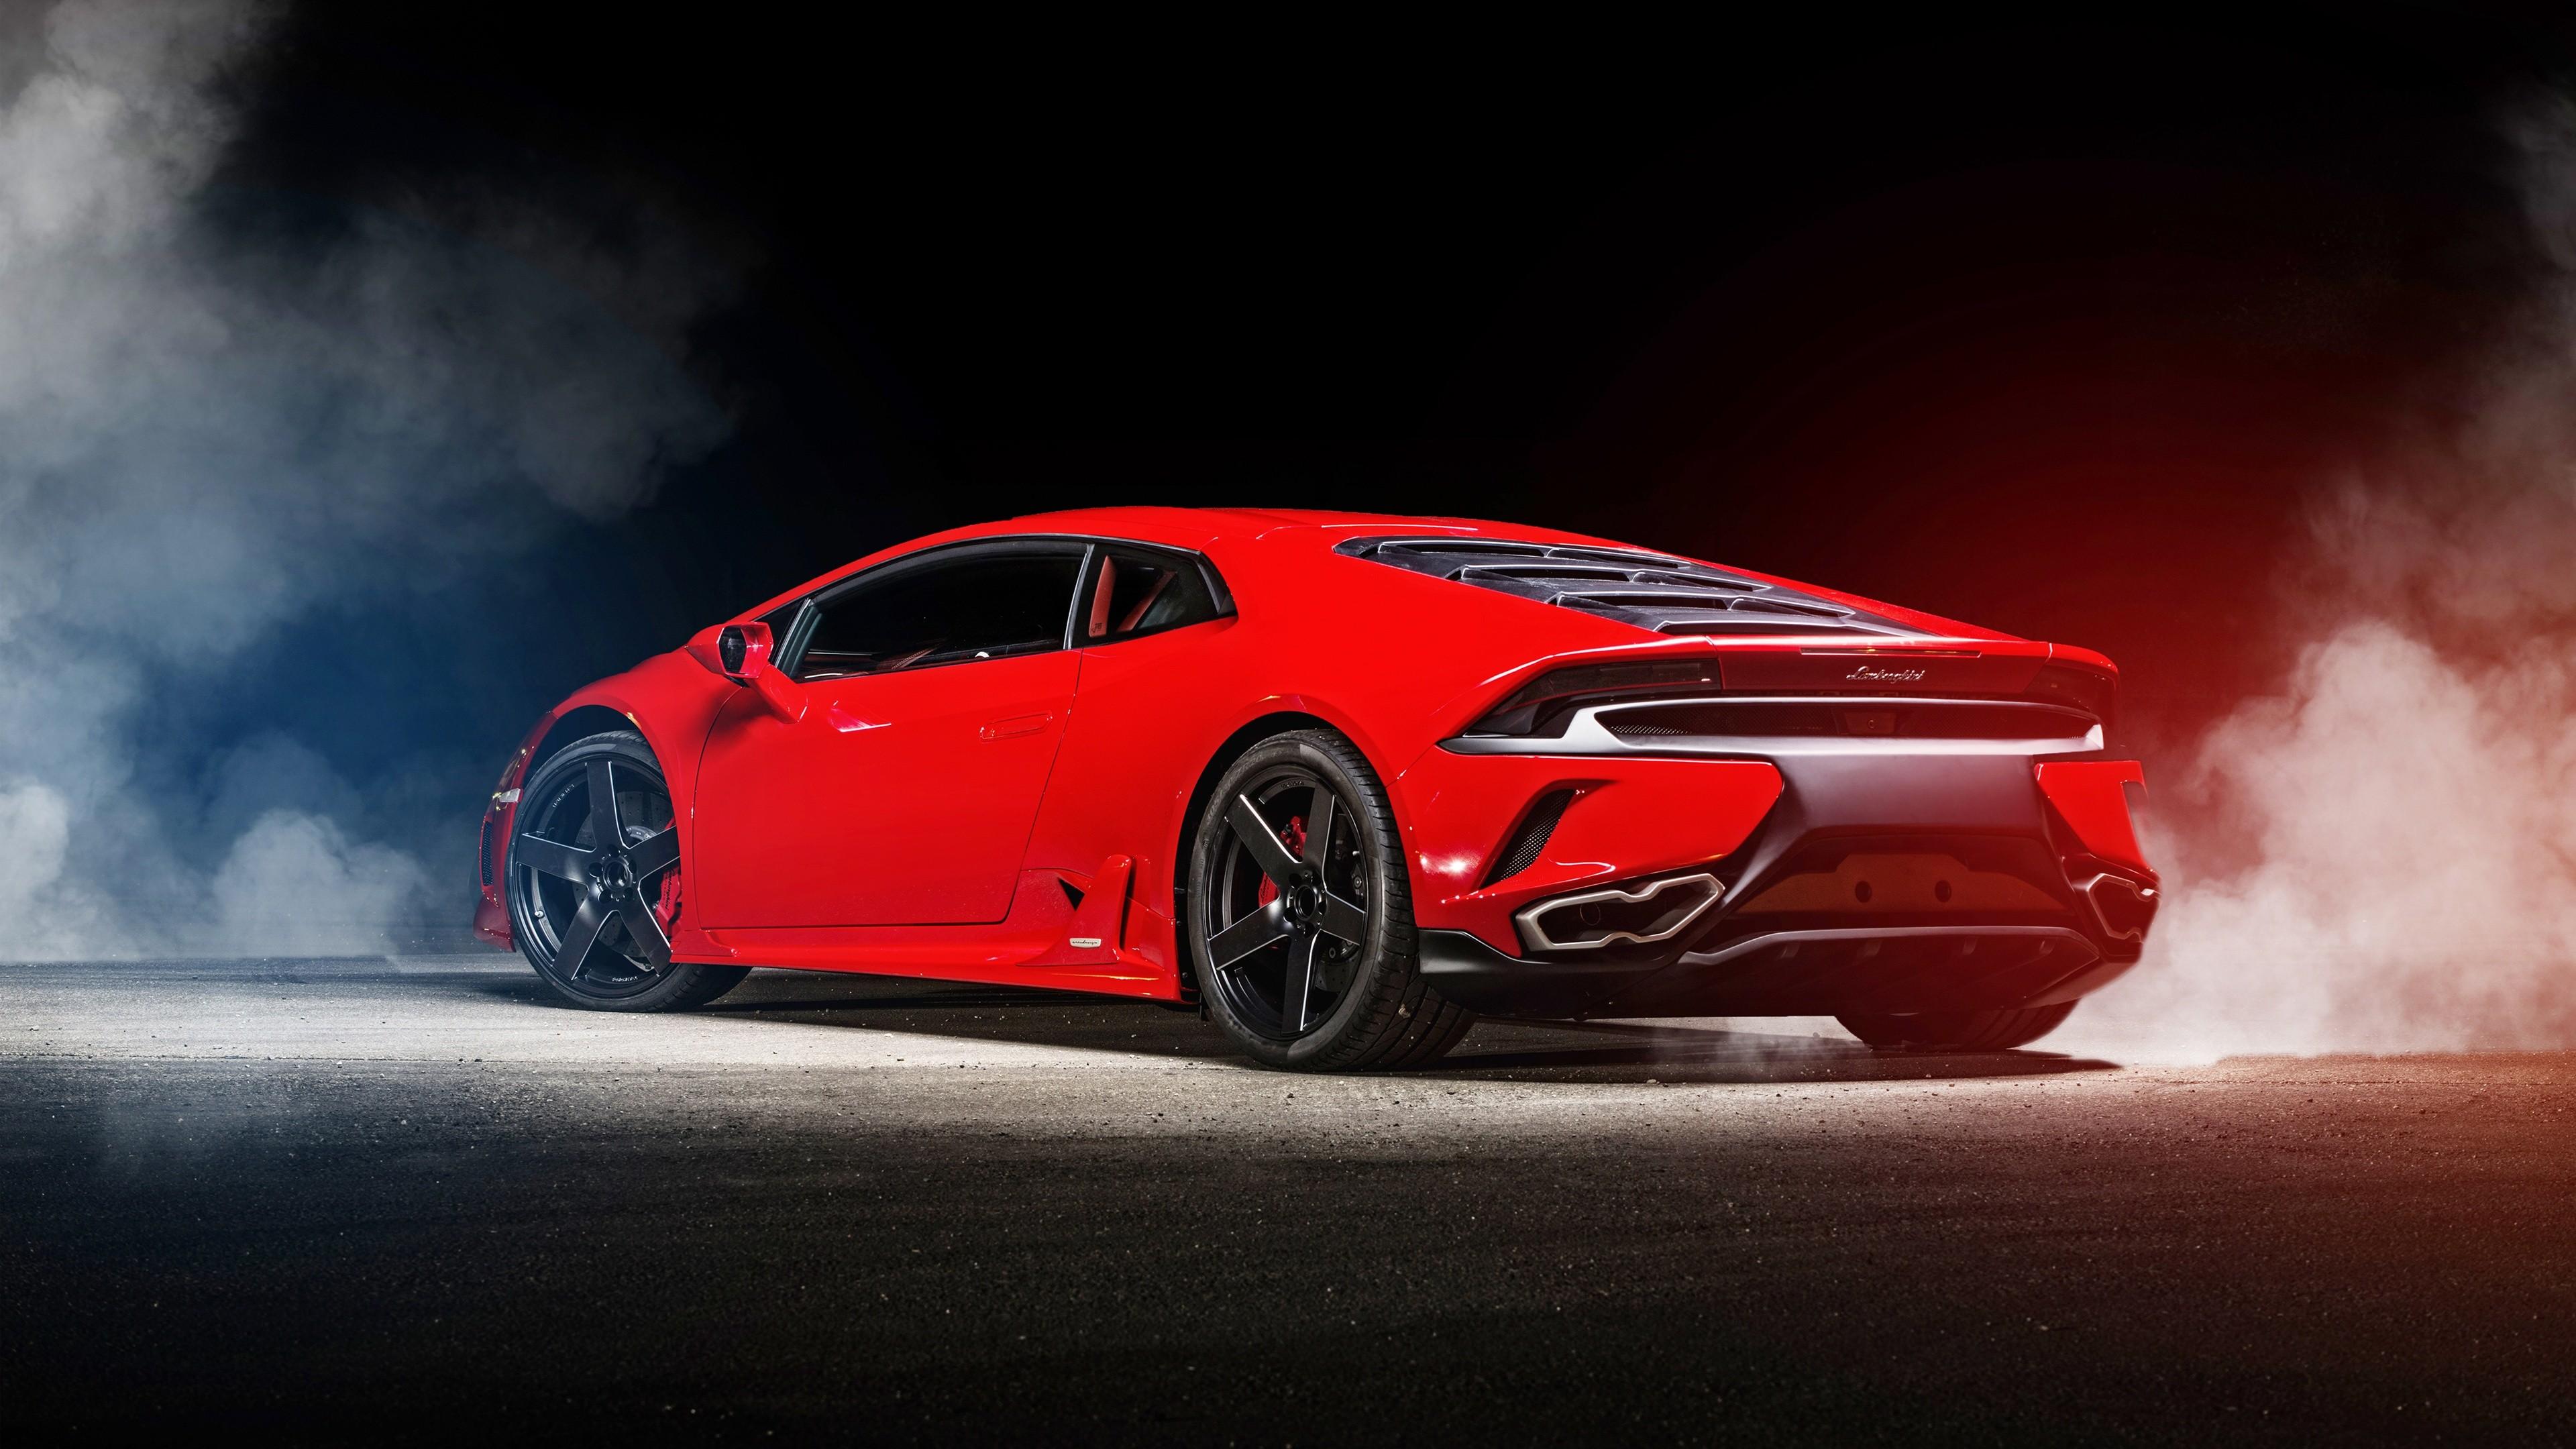 Lamborghini Huracan Wallpaper Desktop Background